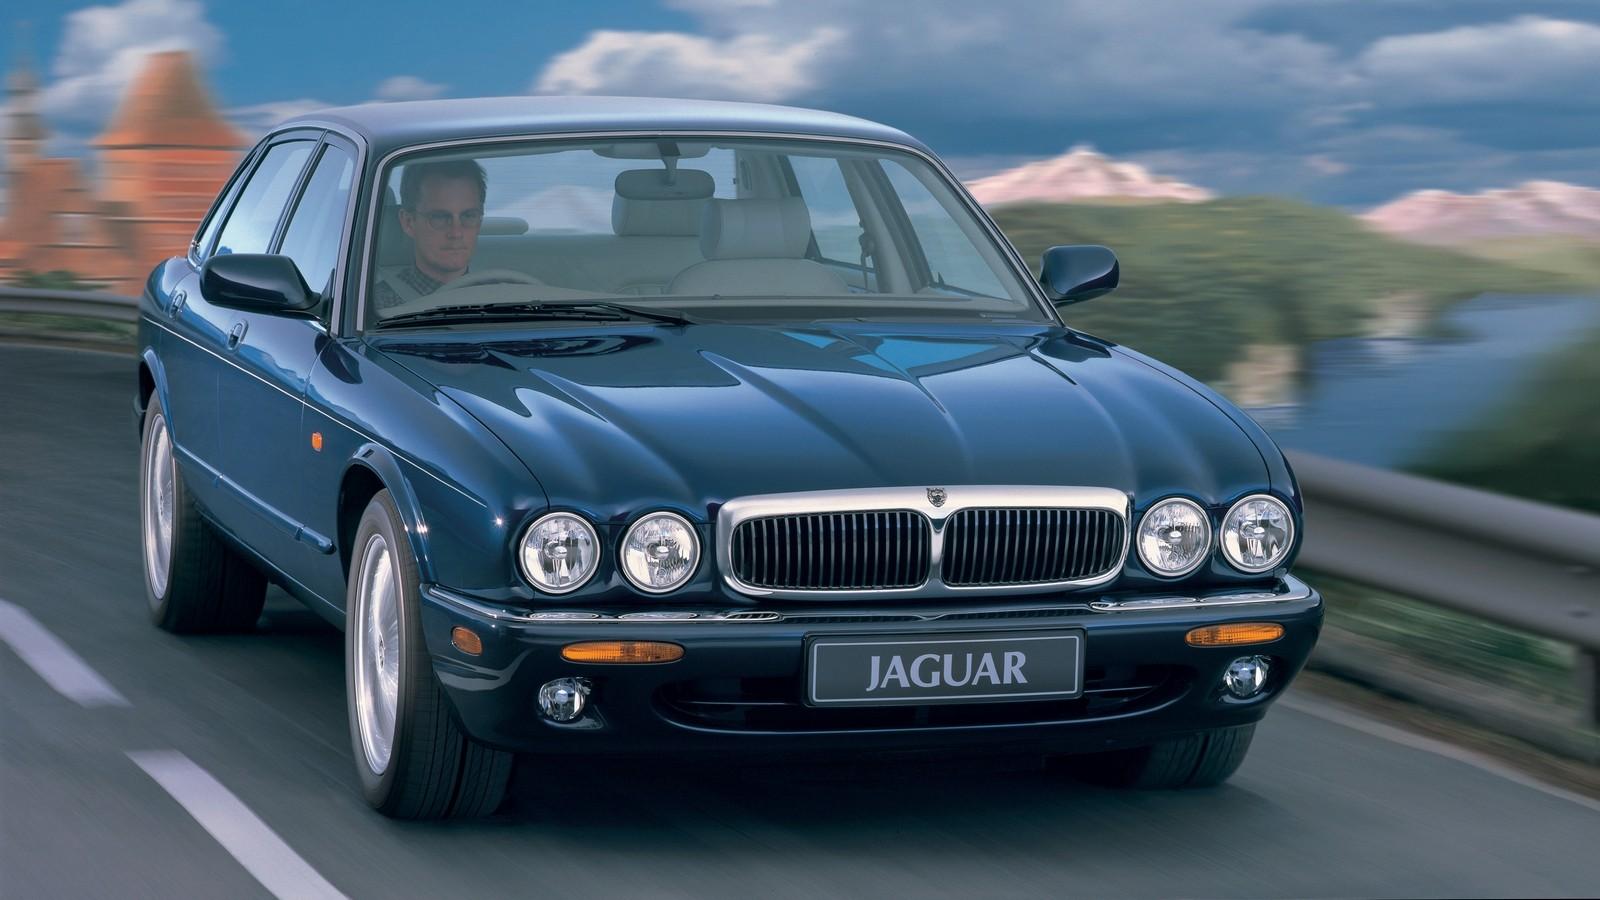 На фото: Jaguar XJ8 (X300) '1997